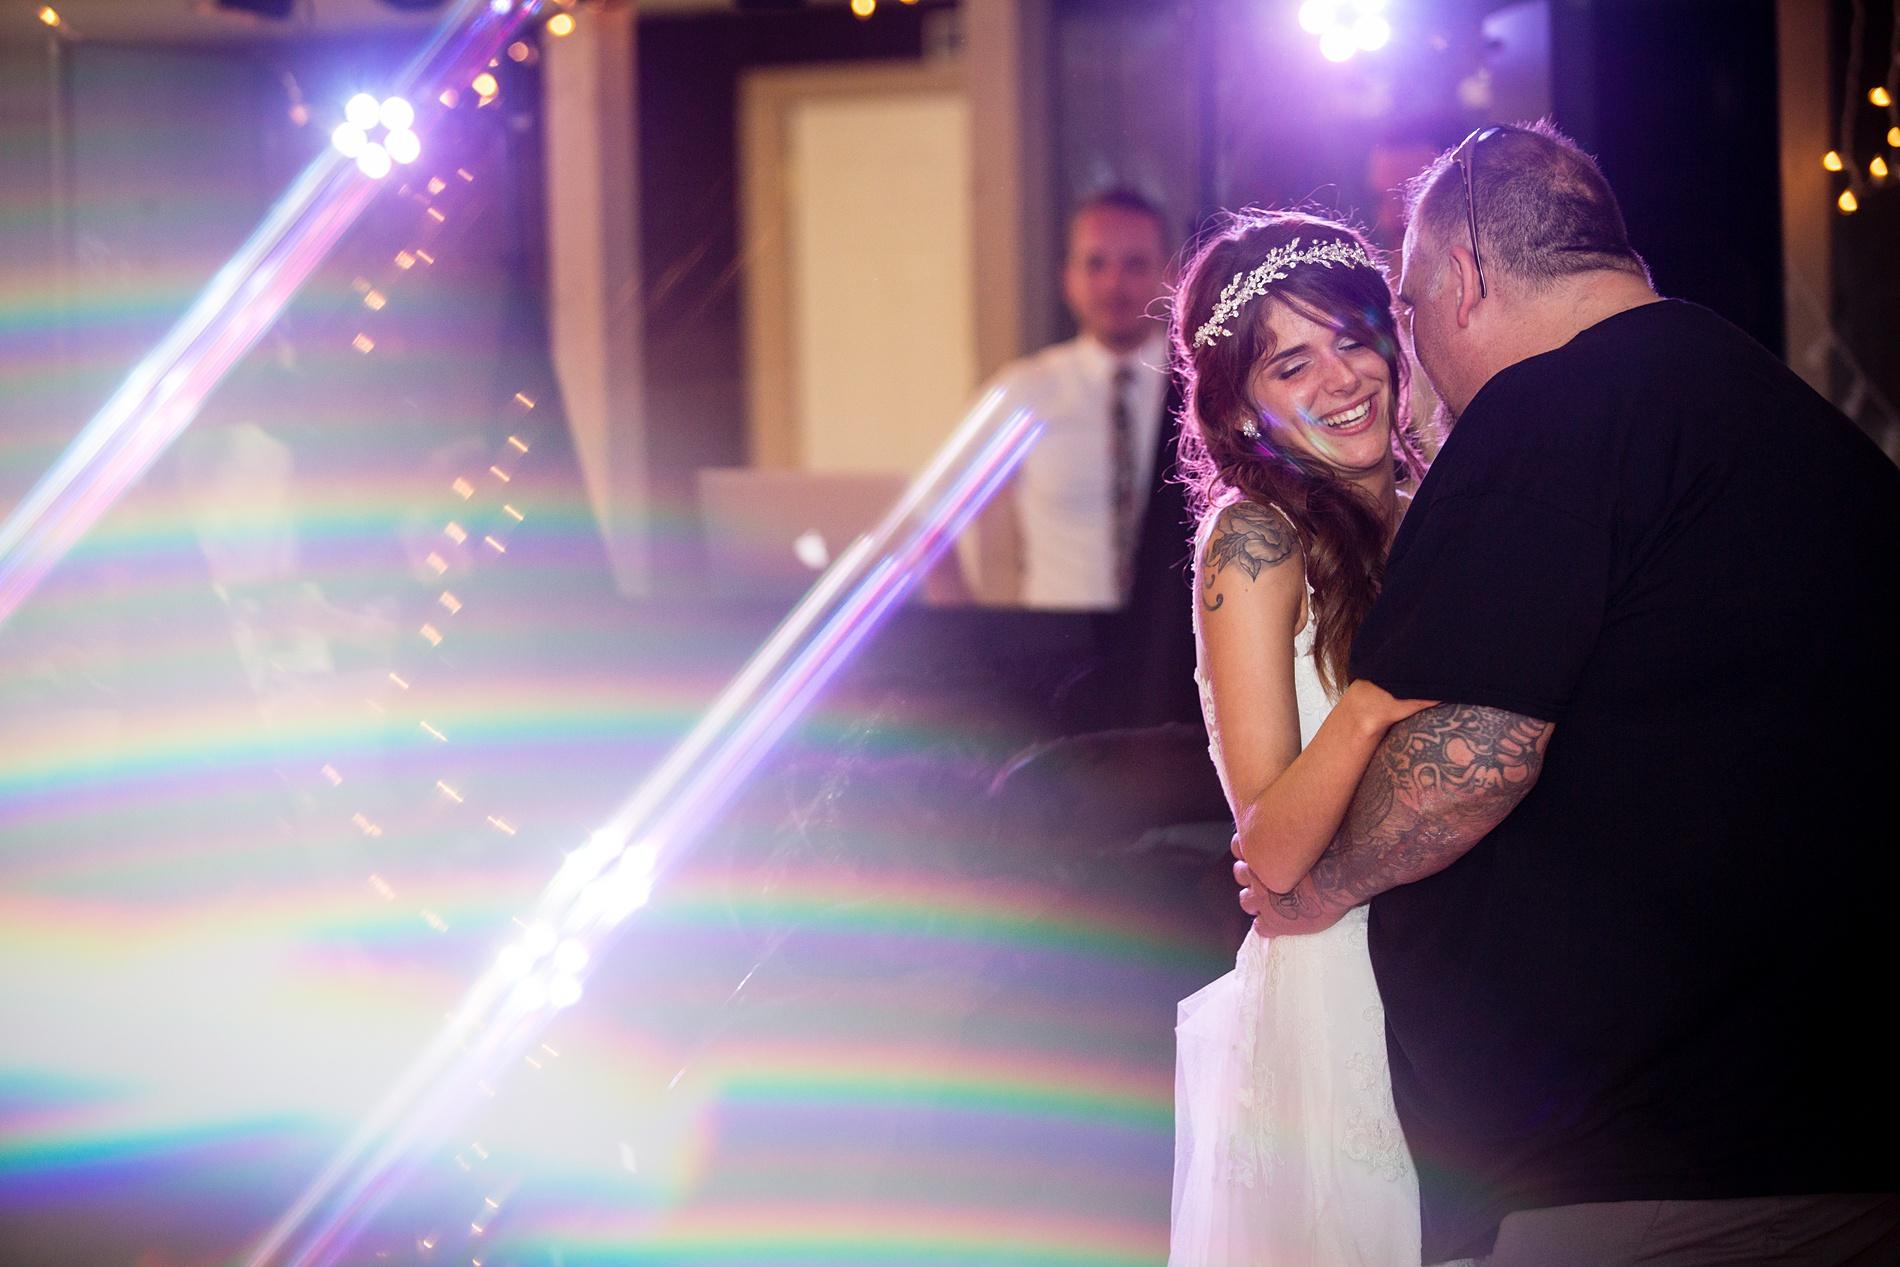 Brandon_Shafer_Photography_Brett_Autumn_Wedding_0060.jpg